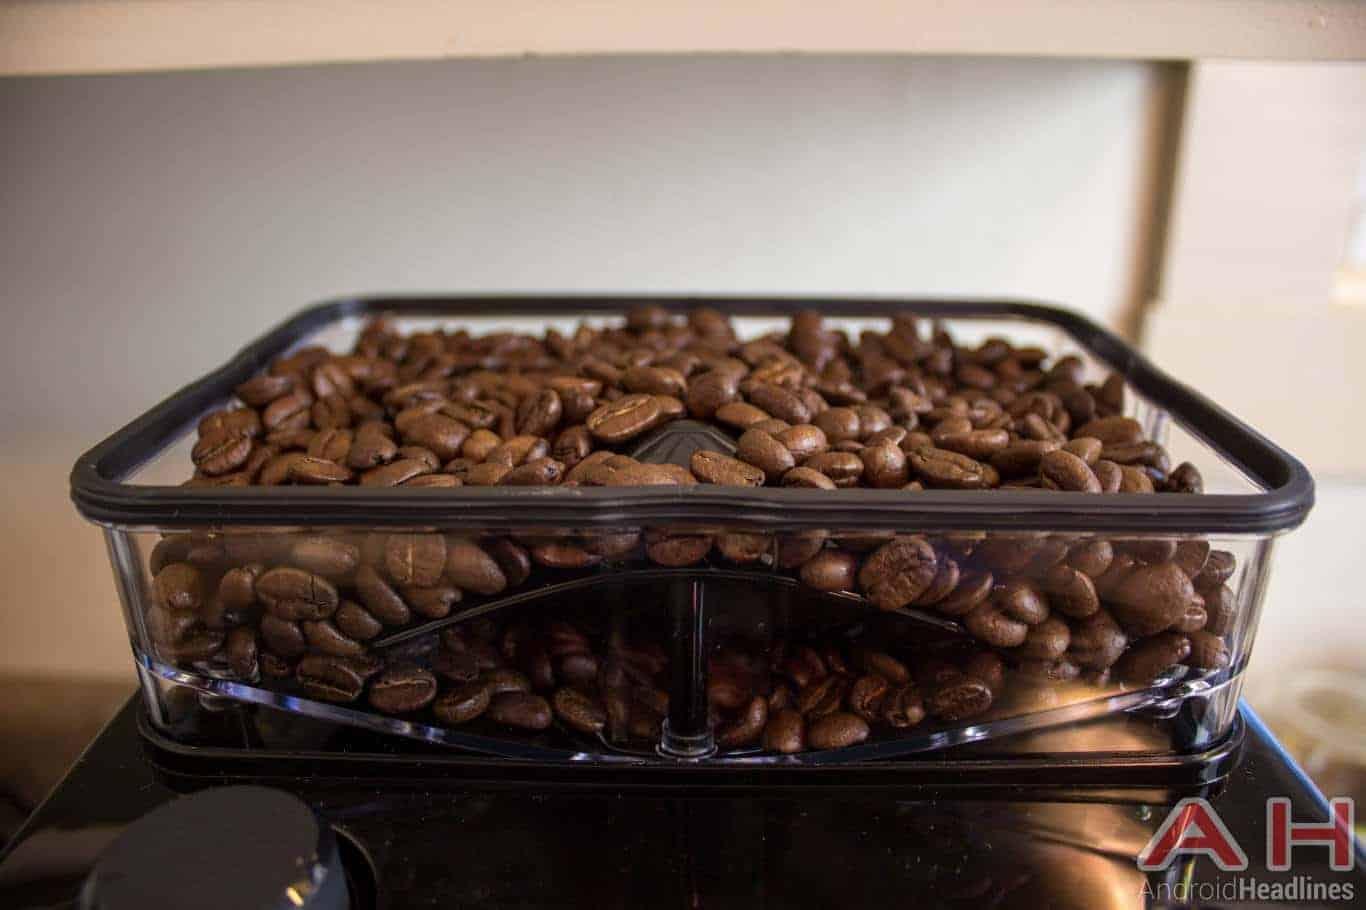 Smarter Coffee AH NS 09